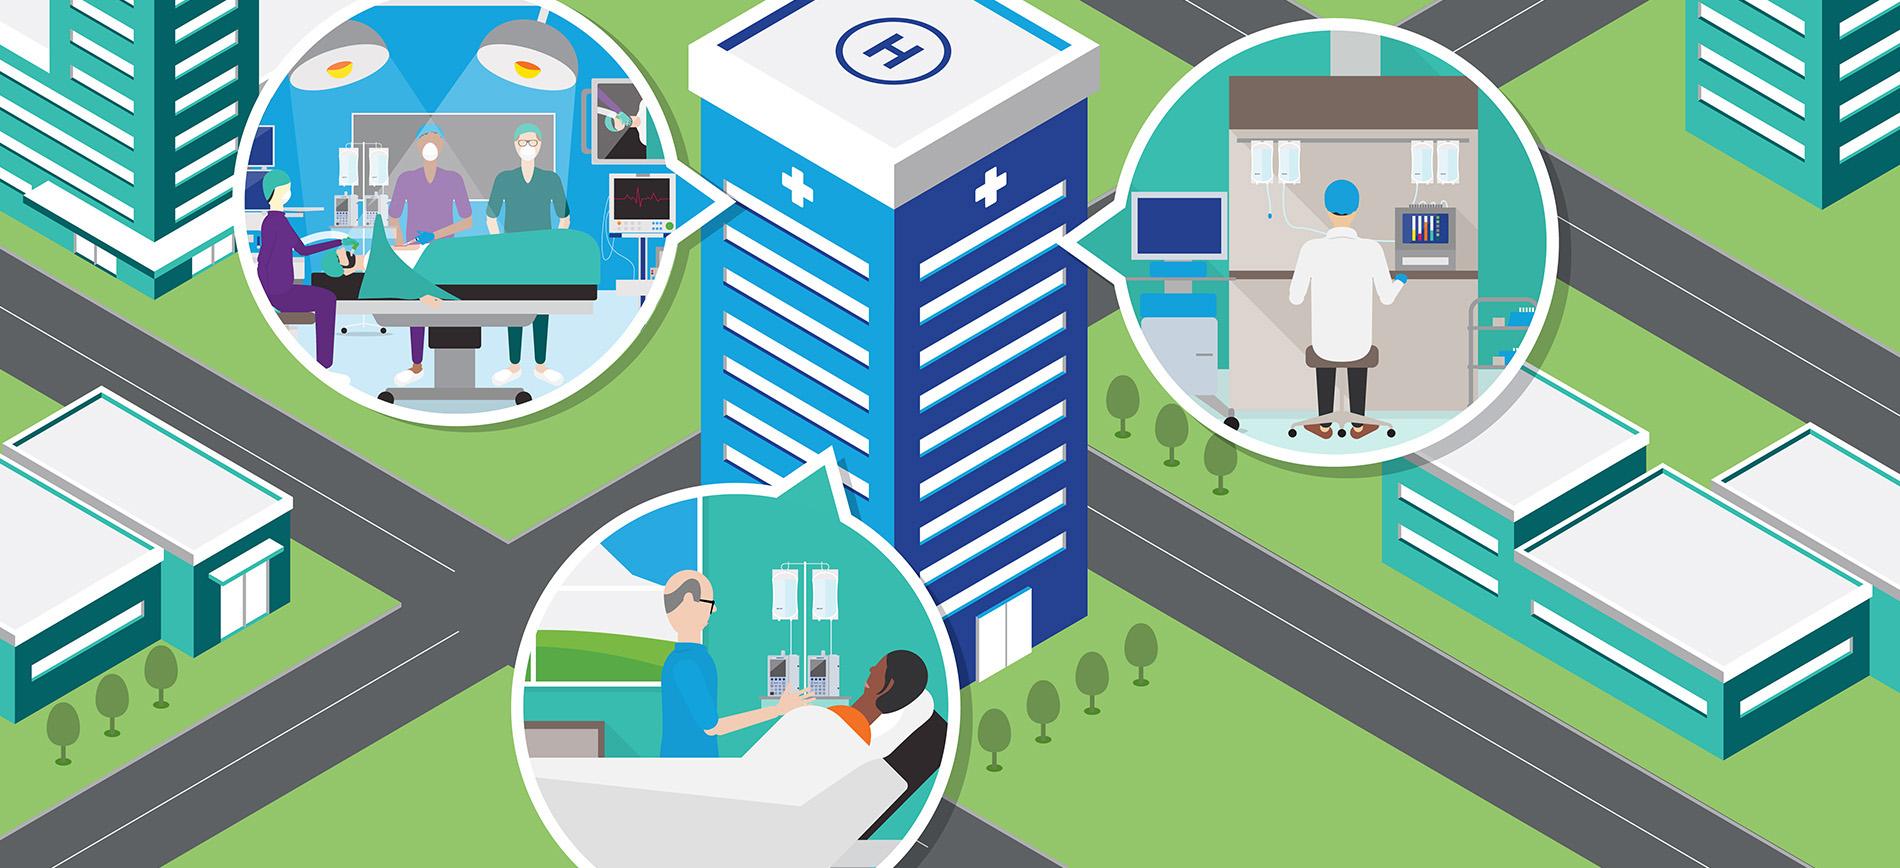 Baxter_animated_city_hospital_scenes.jpg